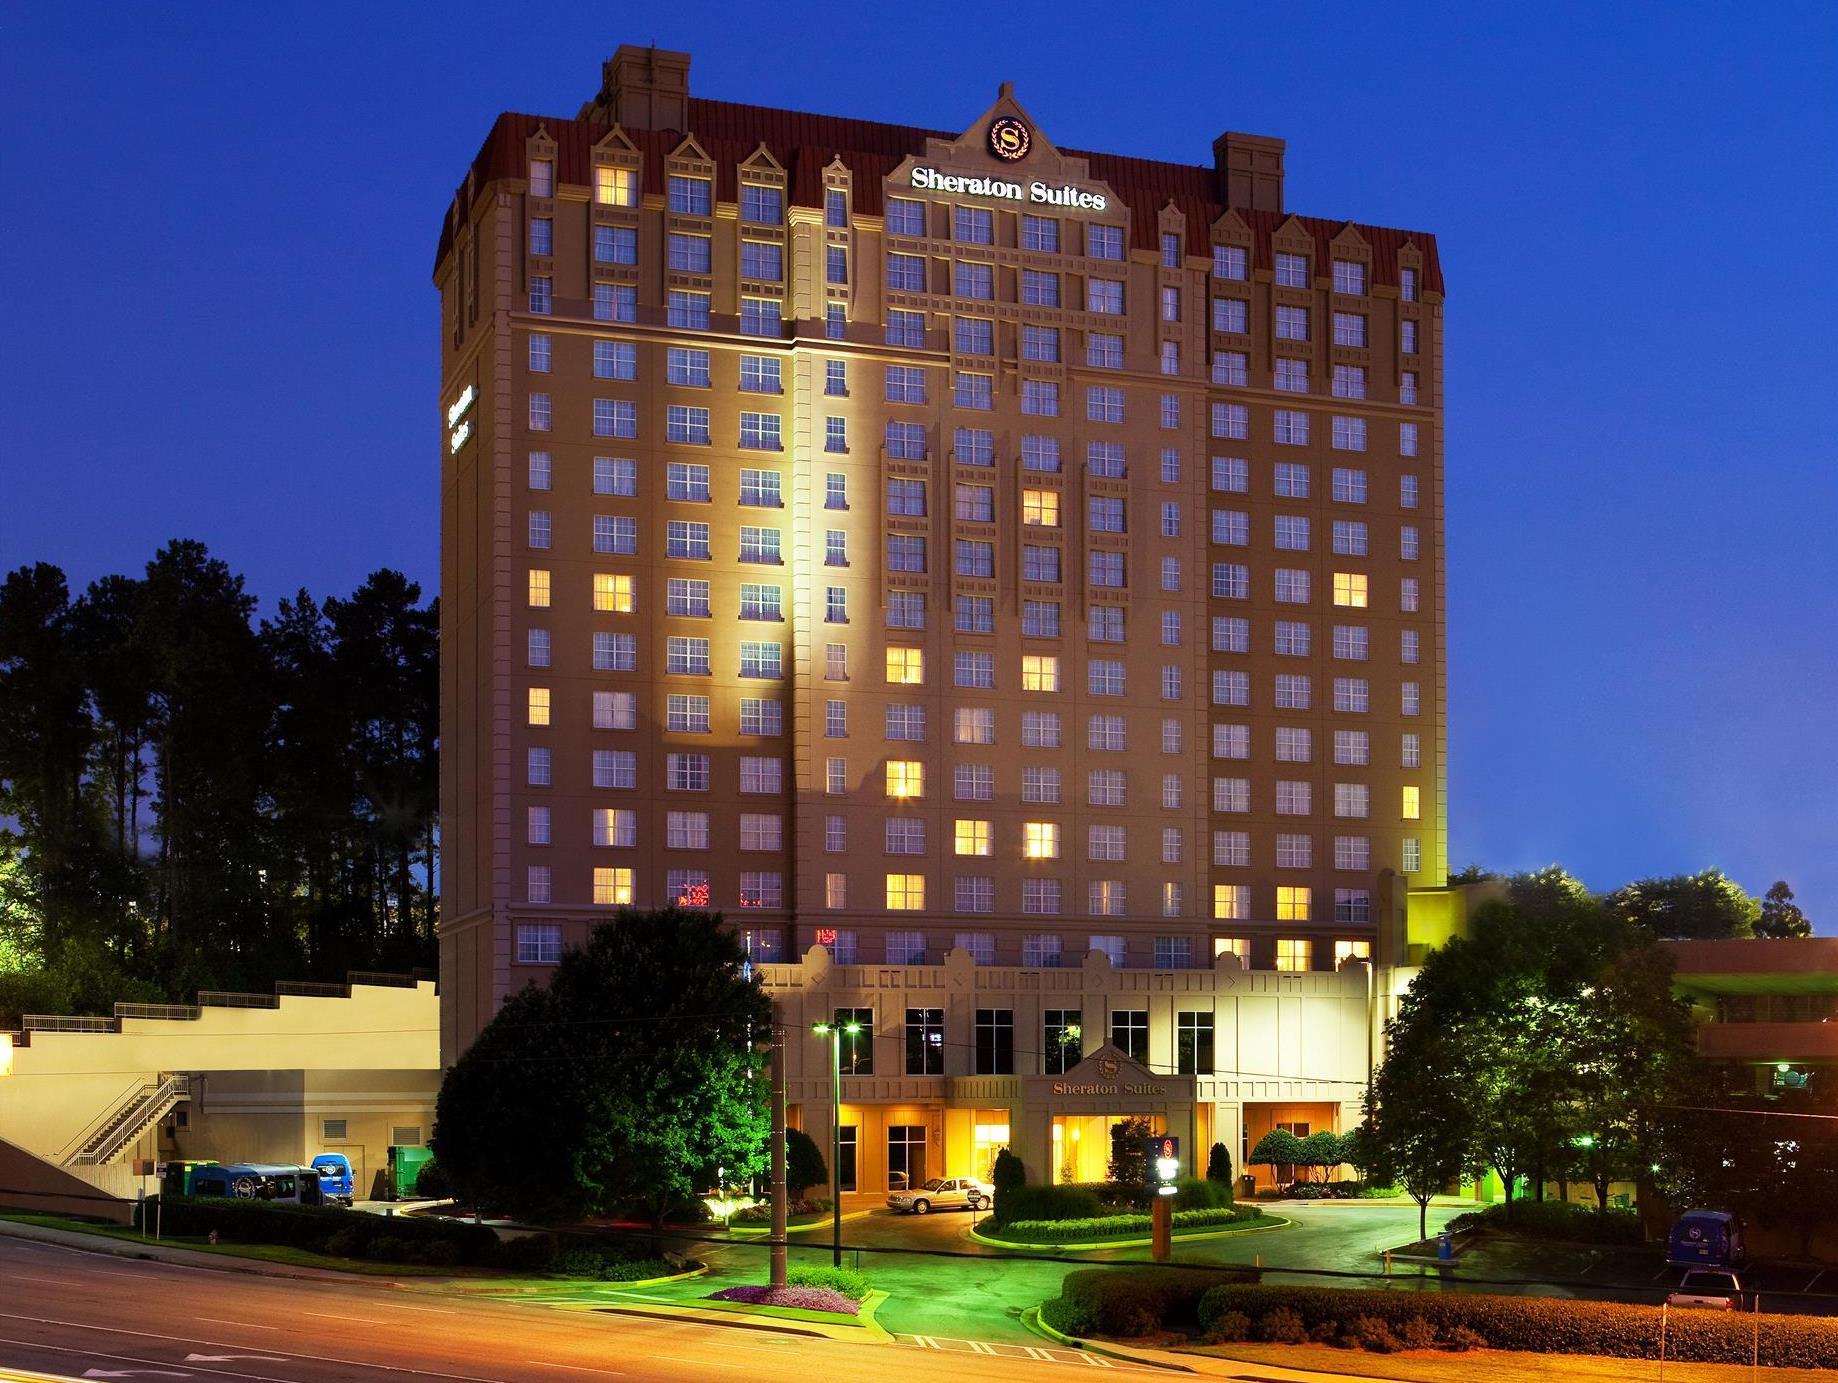 More about Sheraton Suites Galleria Atlanta Sheraton Suites